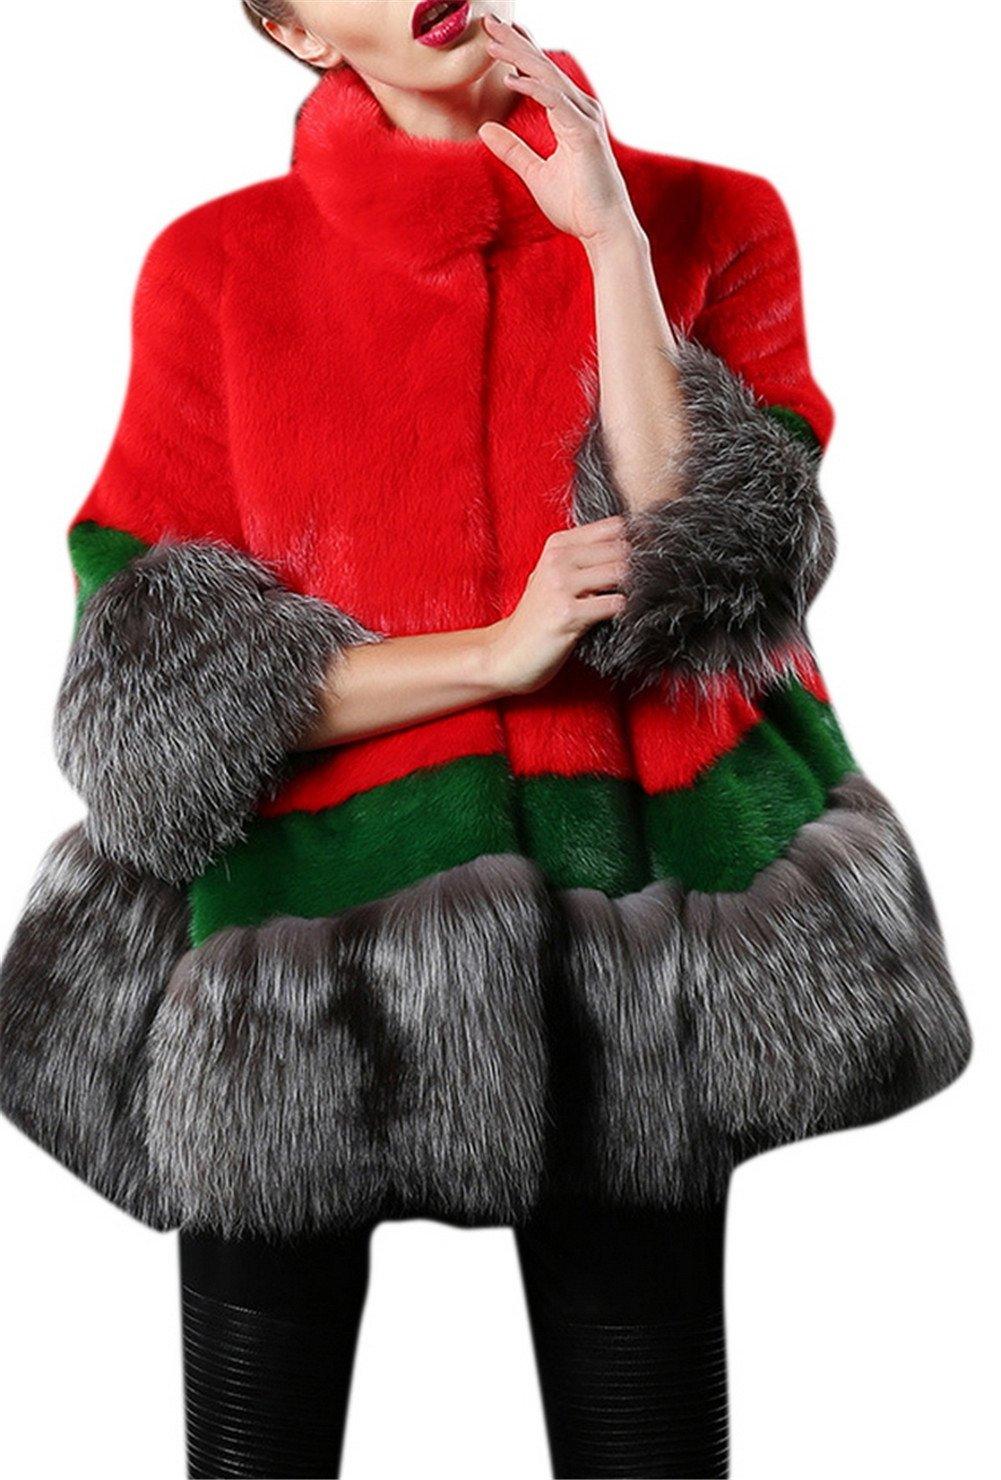 Women's Stylish Fluffy Luxury Faux Fur Mink 3/4 Sleeve Short Party Coat Red XL by TccTccMallrich